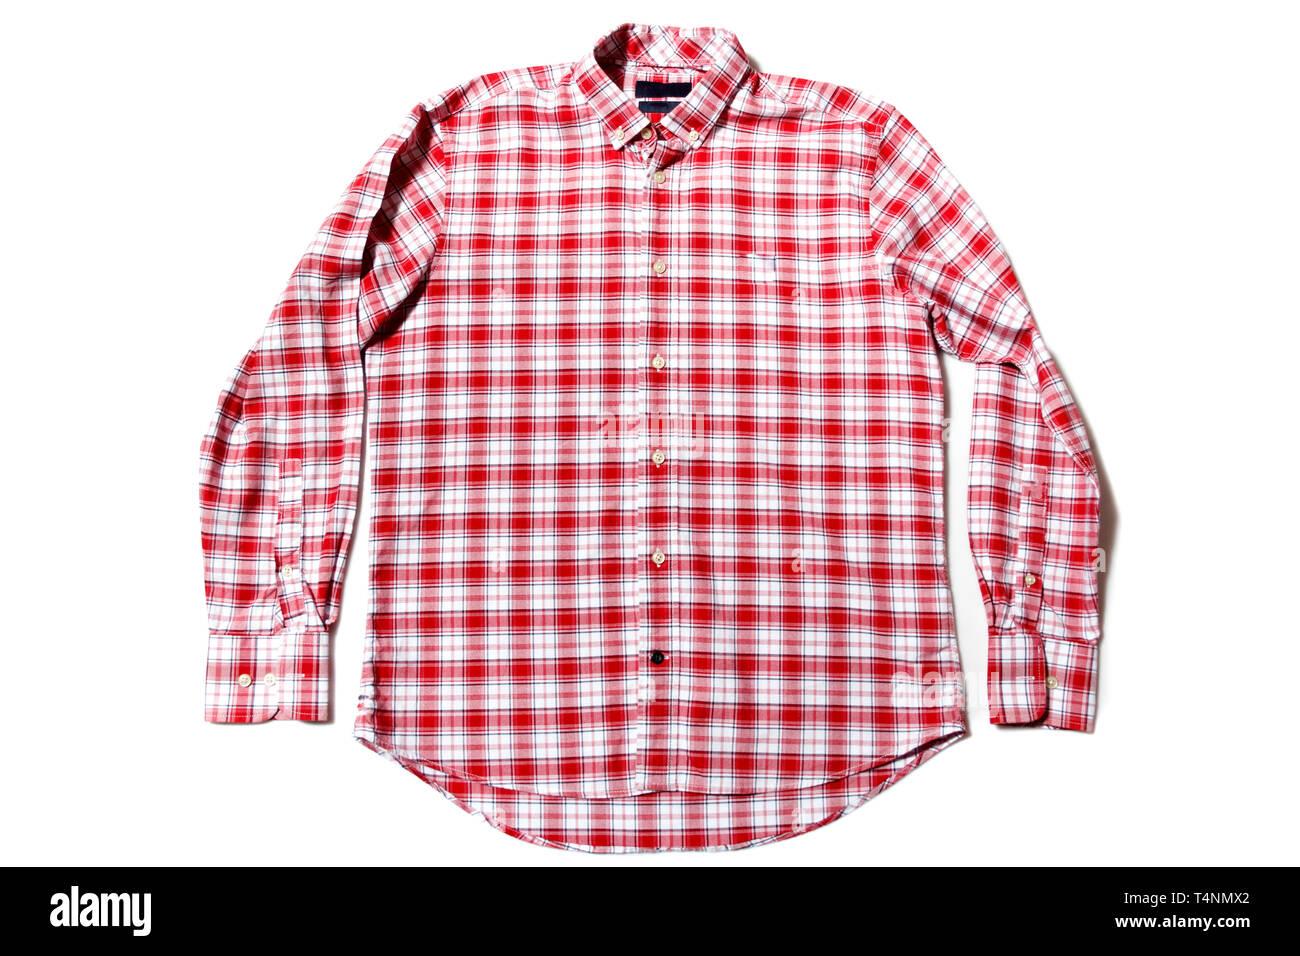 Long sleeve men's shirt - Stock Image